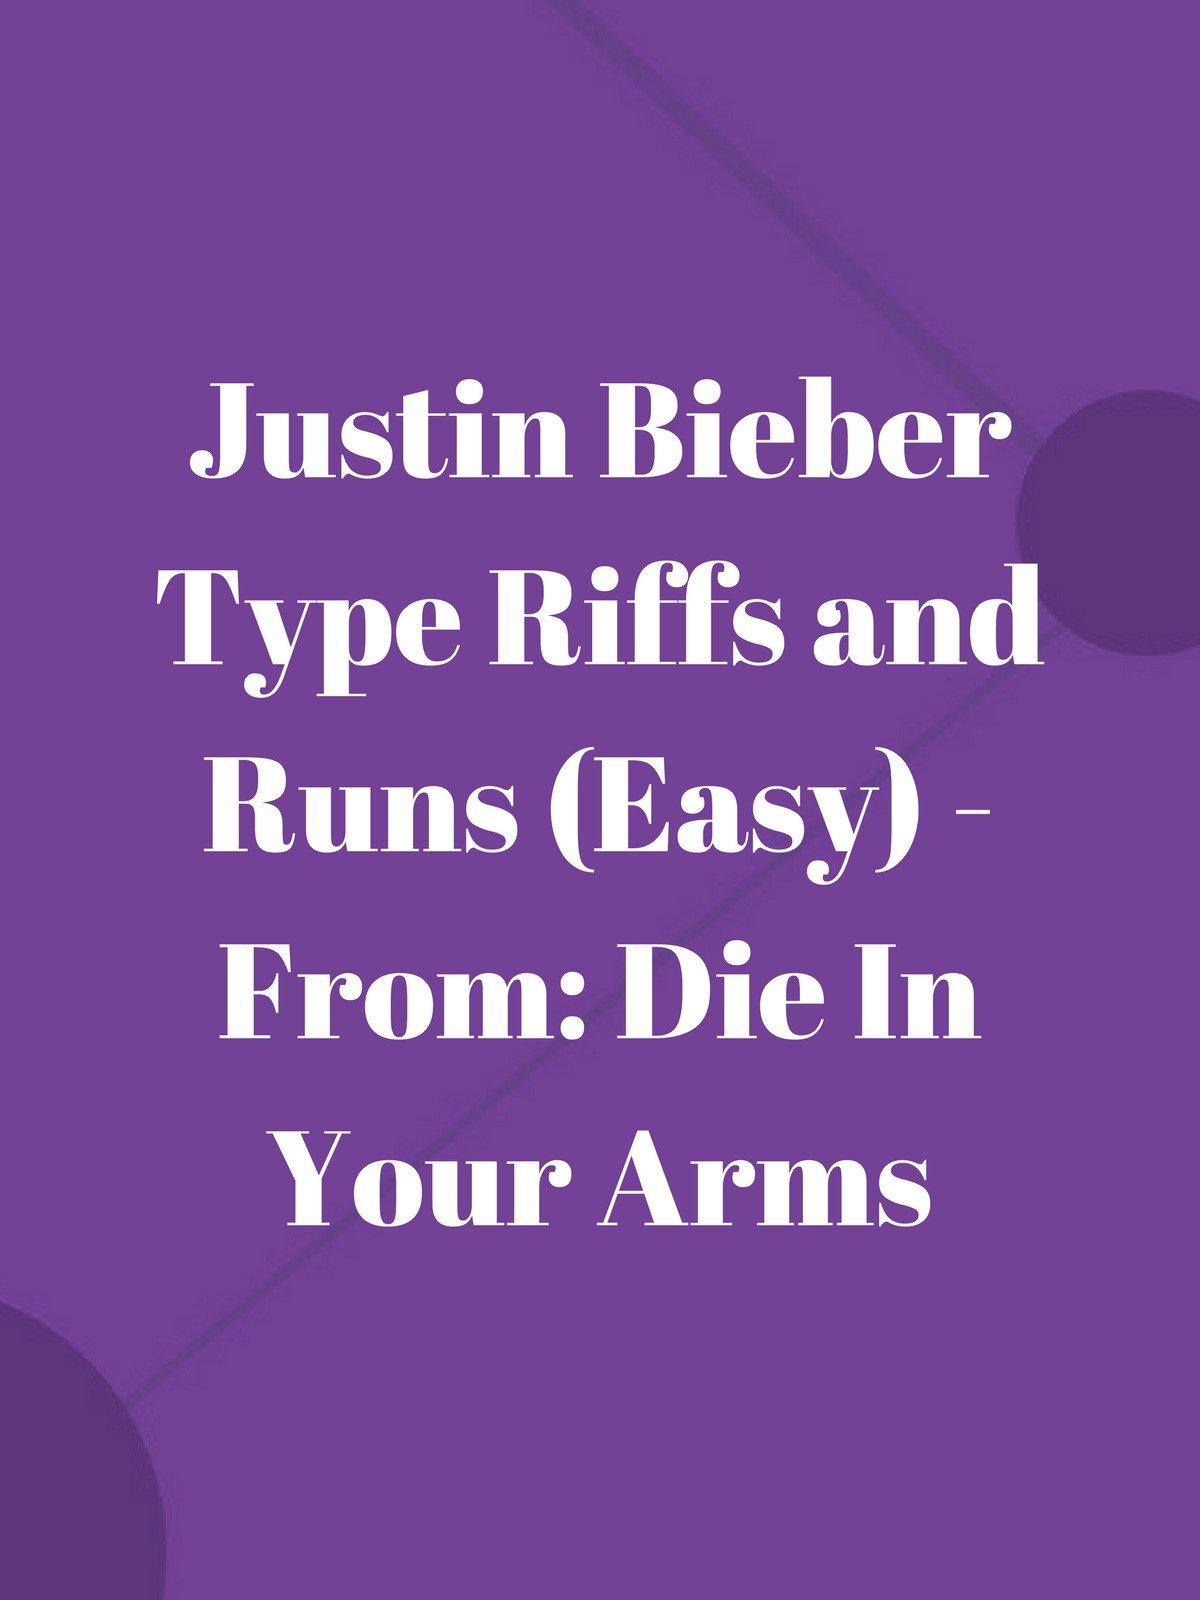 Justin Bieber Type Riffs and Runs (Easy)